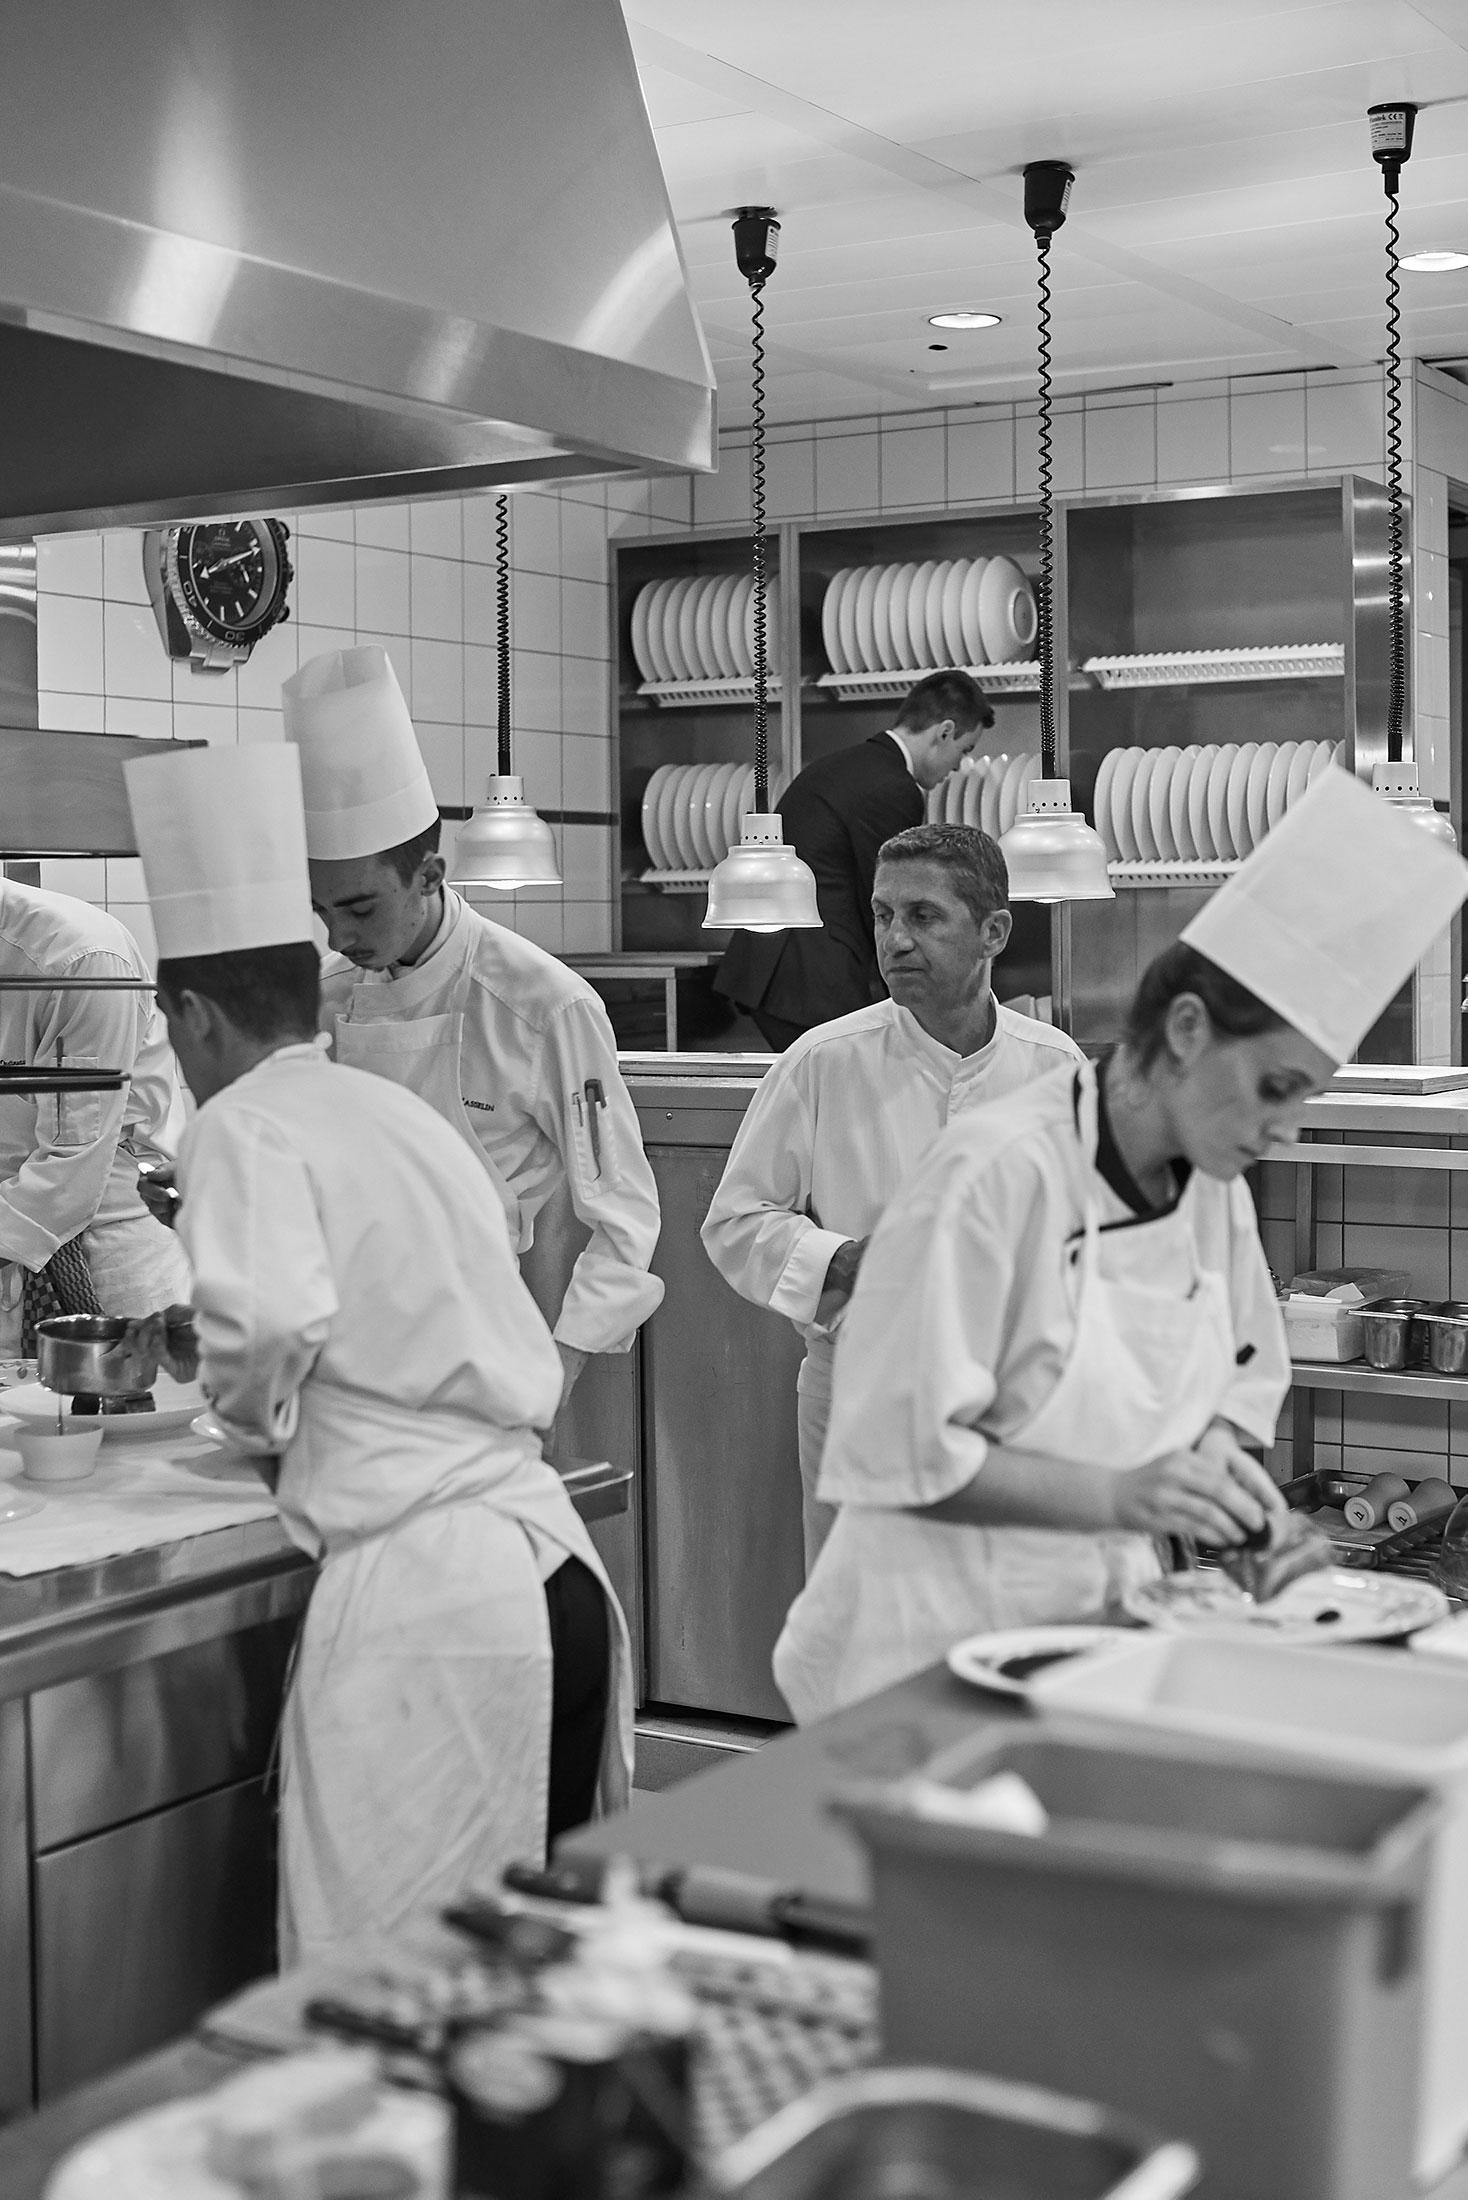 Inside chef Dominique Gauthier's kitchen Beau-Rivage Genève hotel